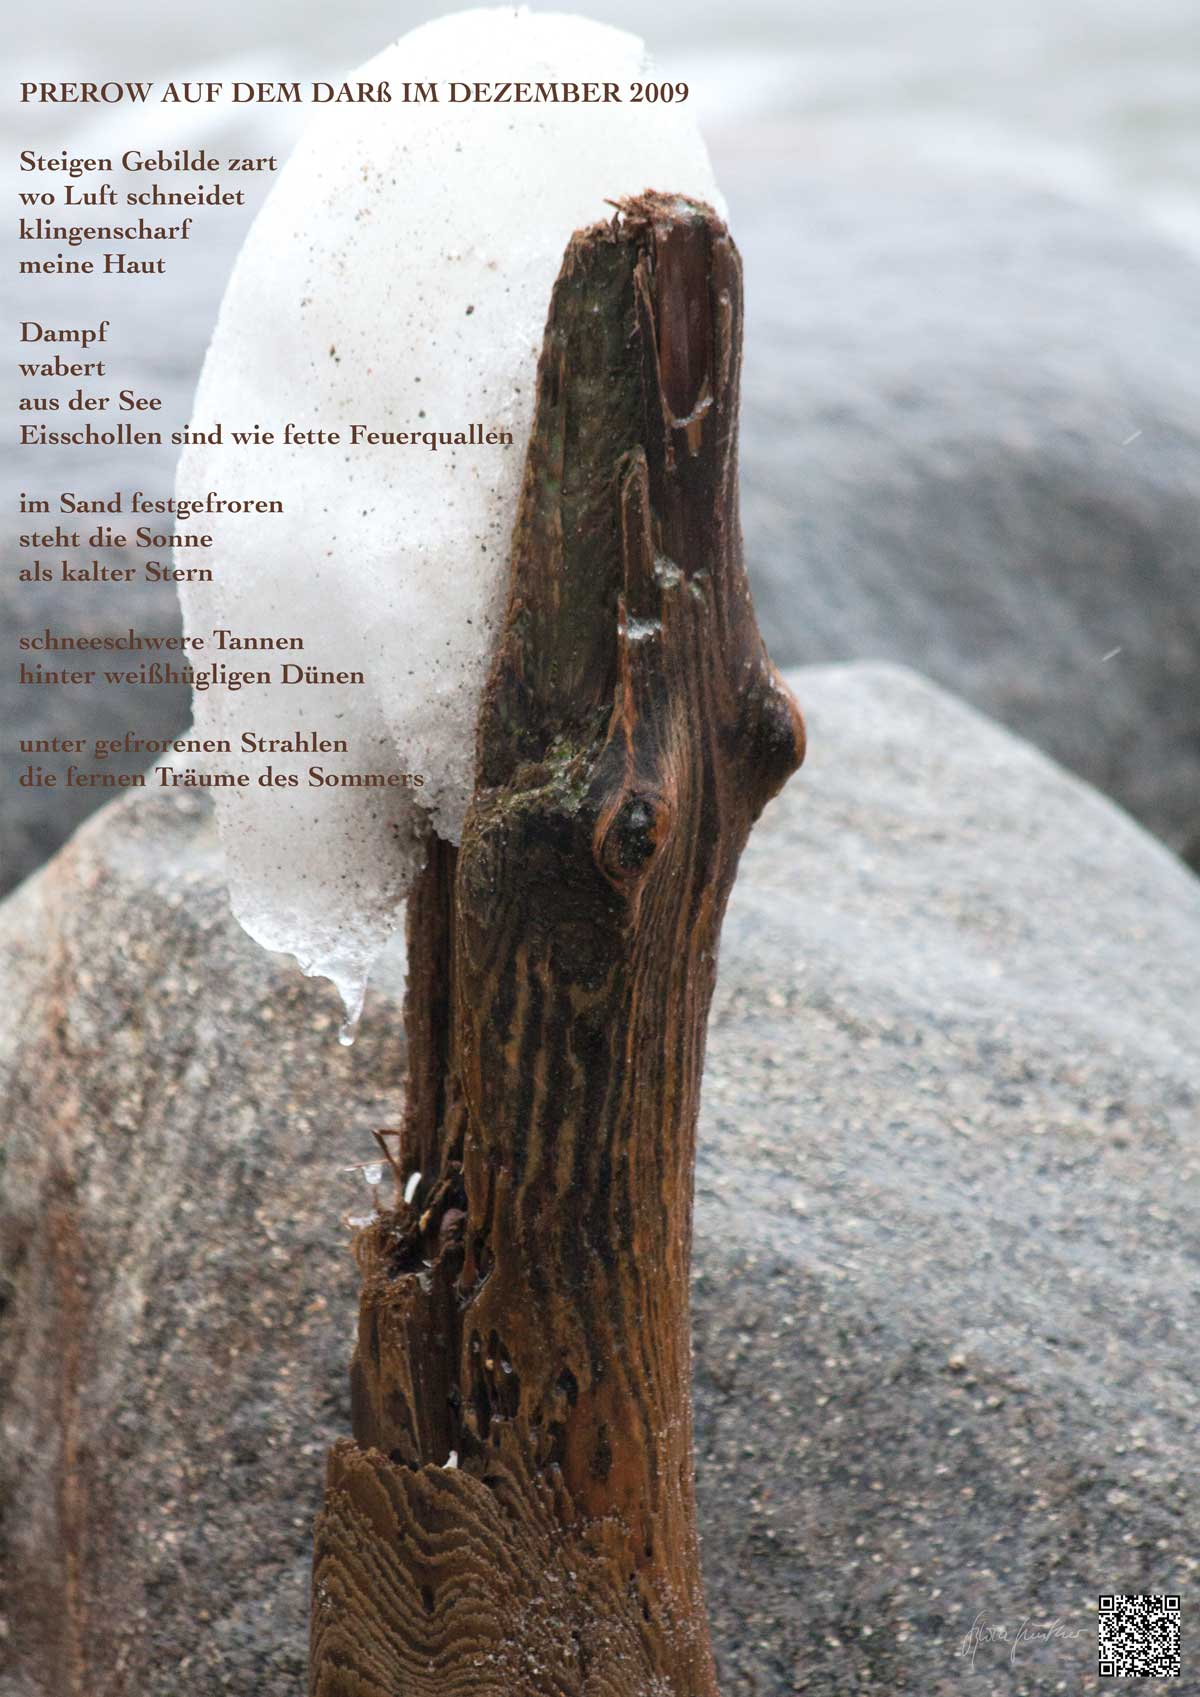 Soundpics: 61 Prerow auf dem Darß im Dezember 2009